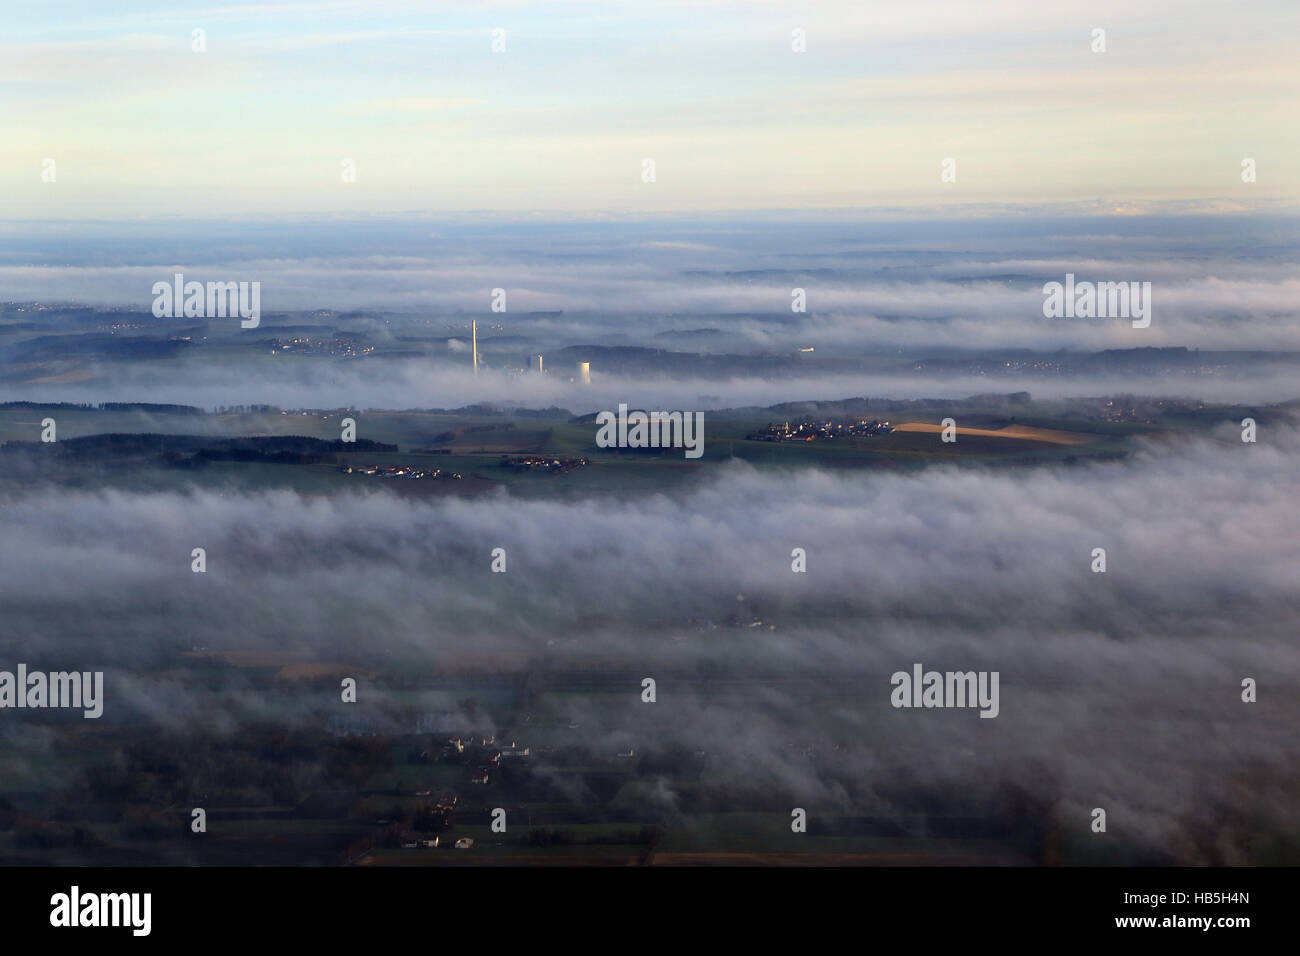 Luftbild Kohlekraftwerk Zolling in Bayern - Stock Image